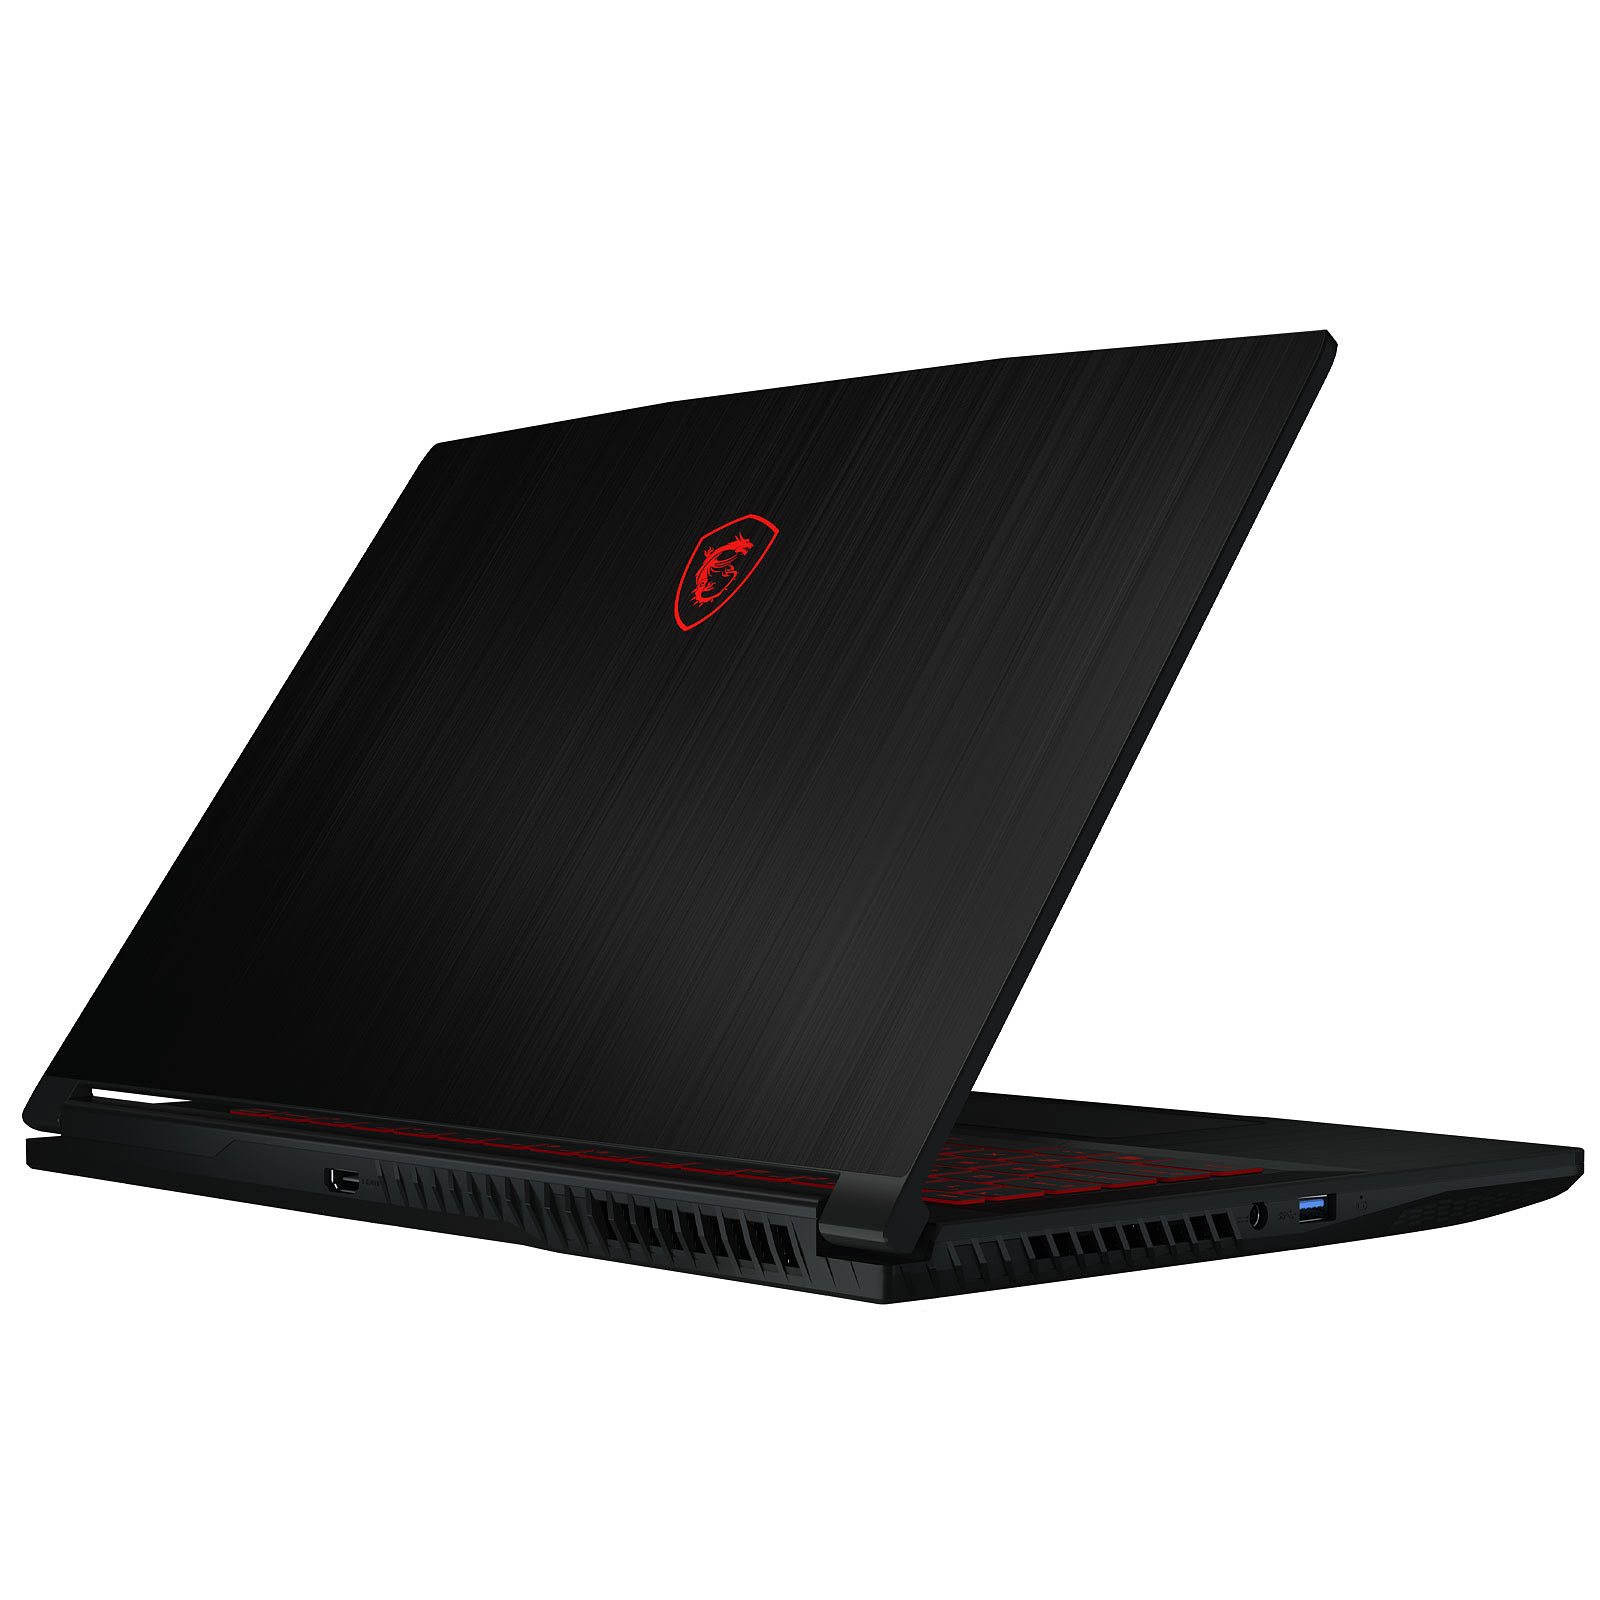 GF63 Thin 10SCSR-1202XFR (9S7-16R412-1202) - Achat / Vente PC portable sur Picata.fr - 1